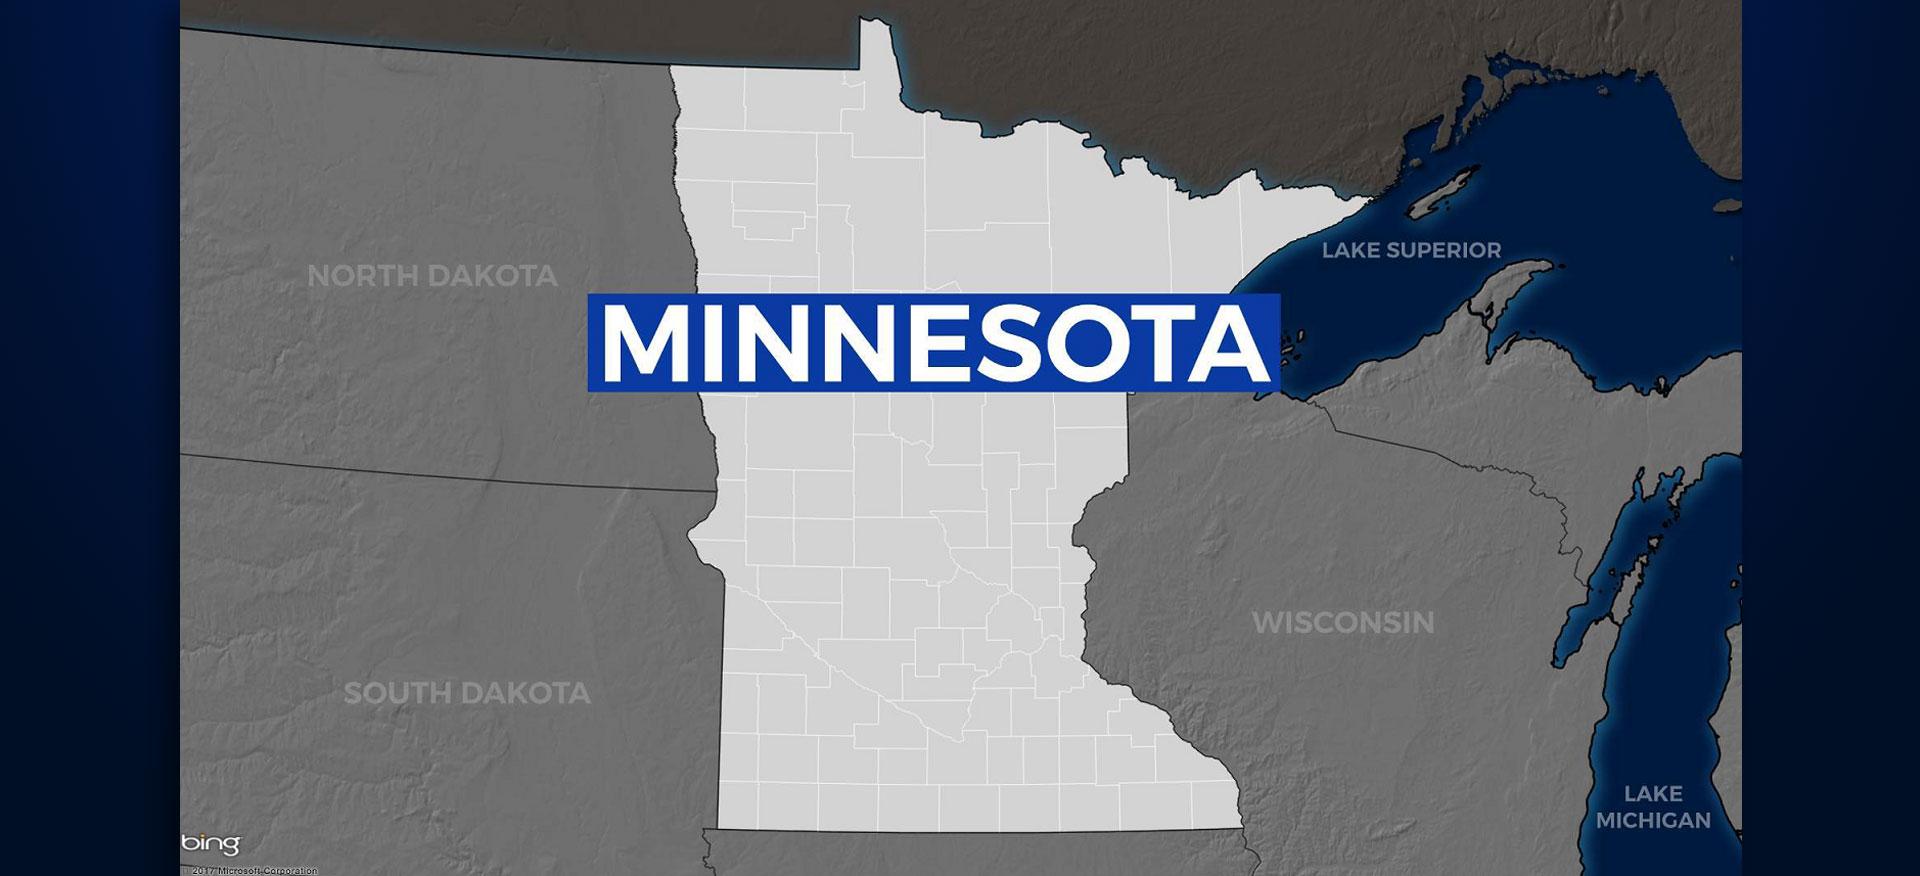 KELO Minnesota General